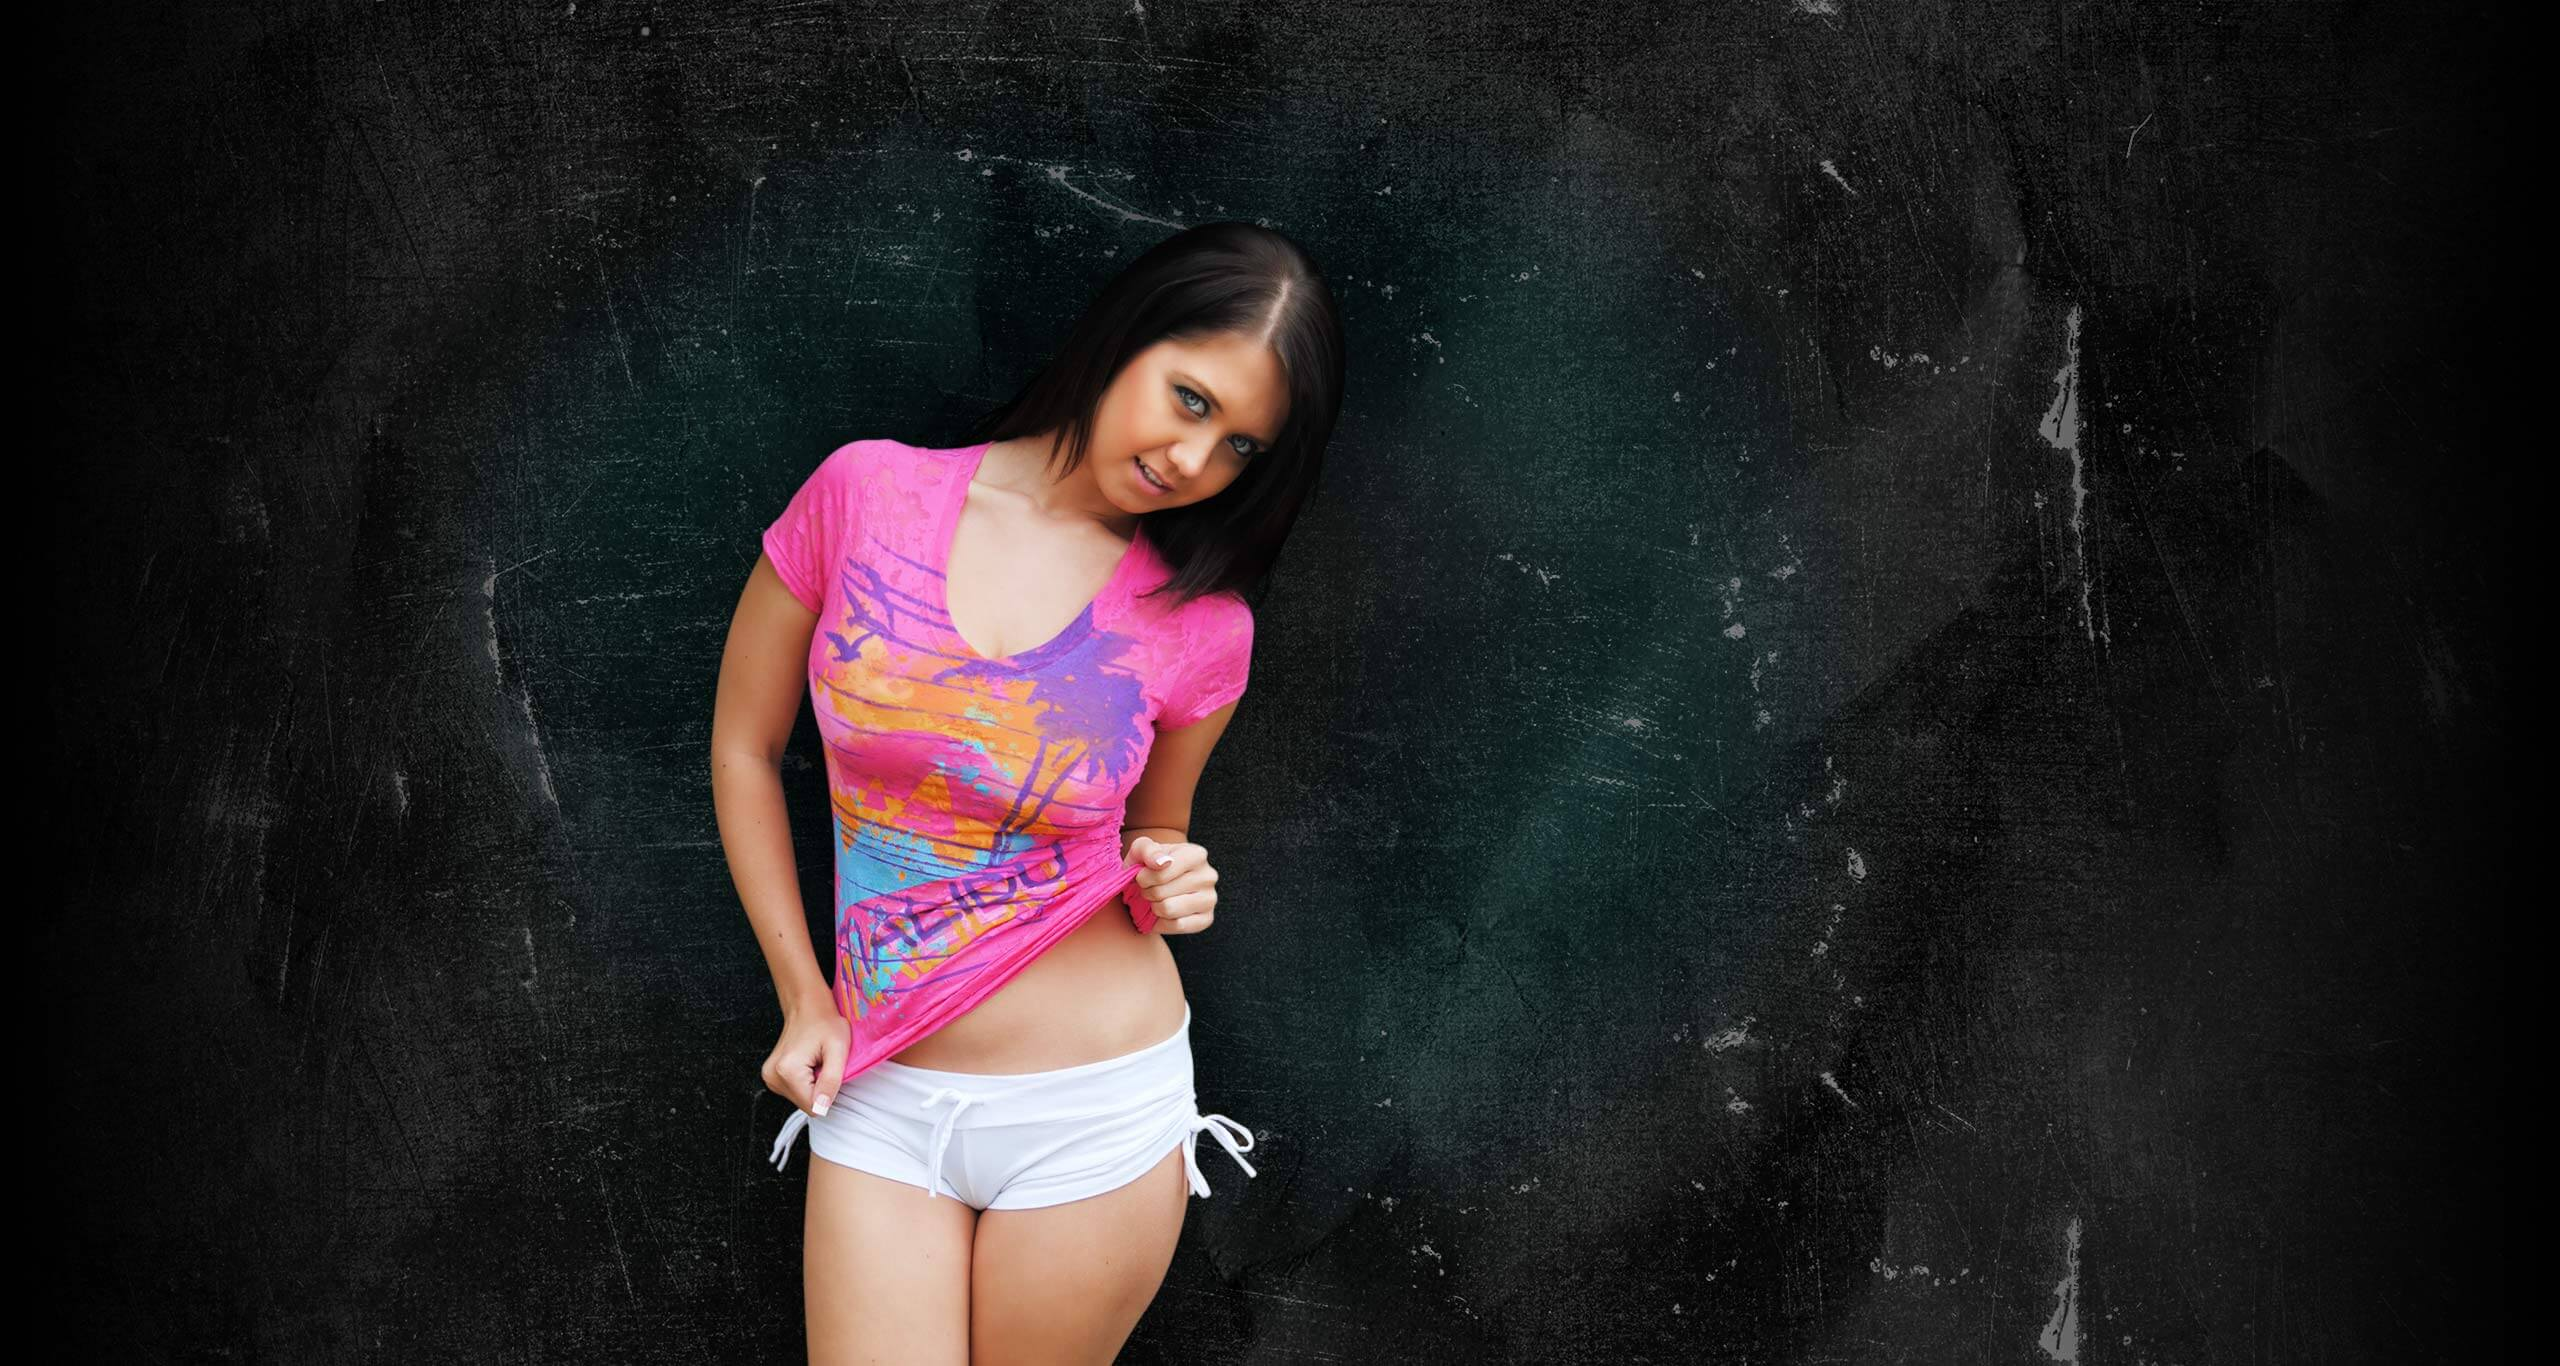 fsk18/l/FlirtChat/2.jpg